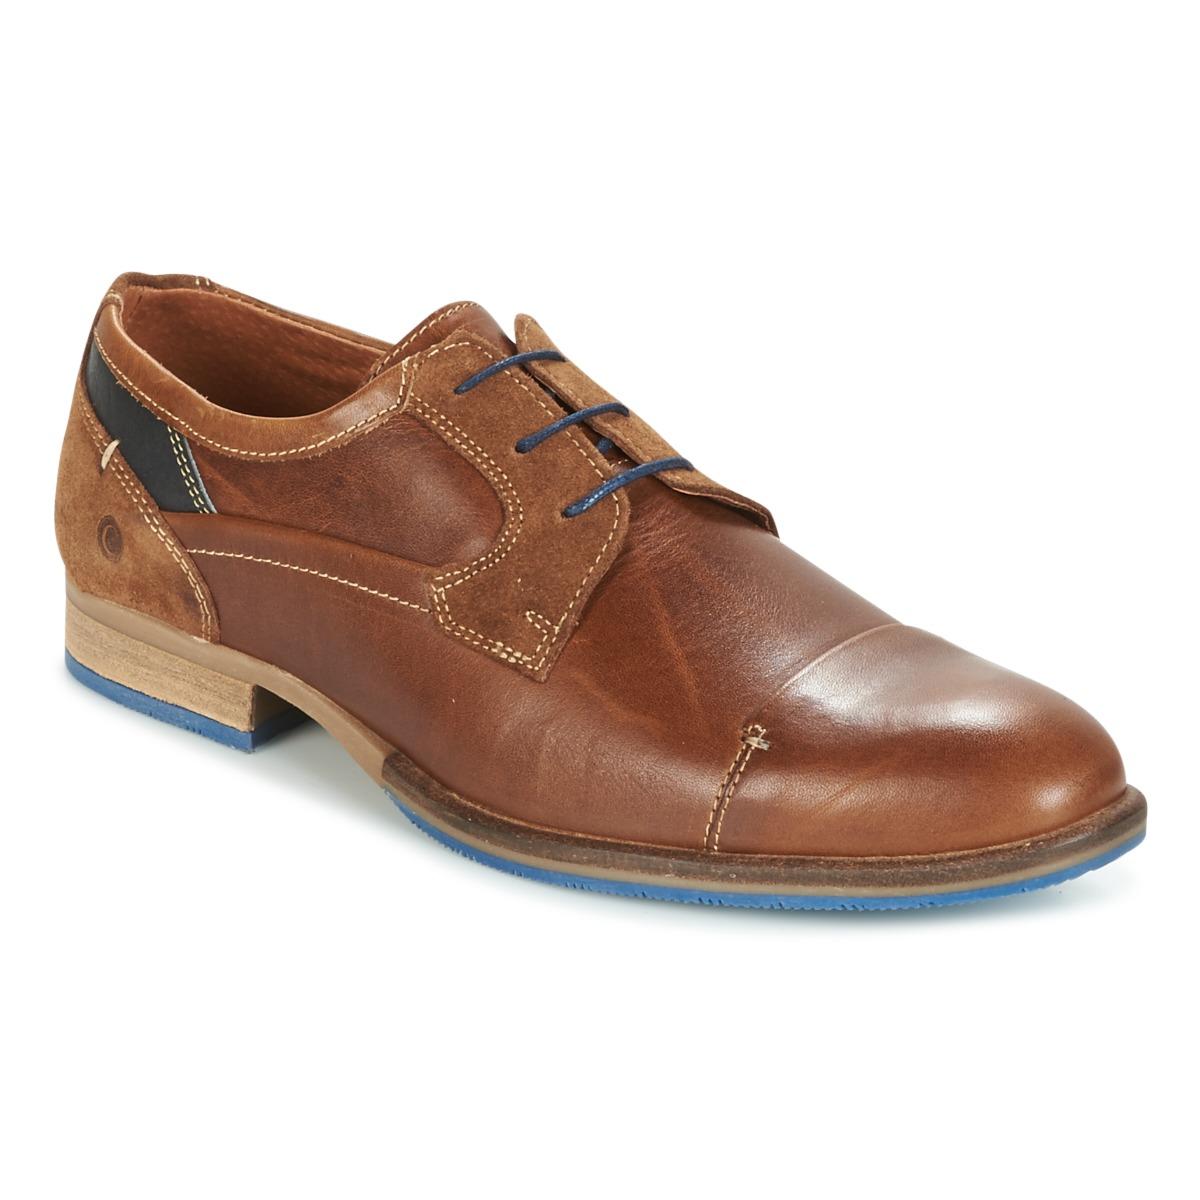 Carlington ENDRI Camel - Kostenloser Versand bei Spartoode ! - Schuhe Derby-Schuhe Herren 47,99 €